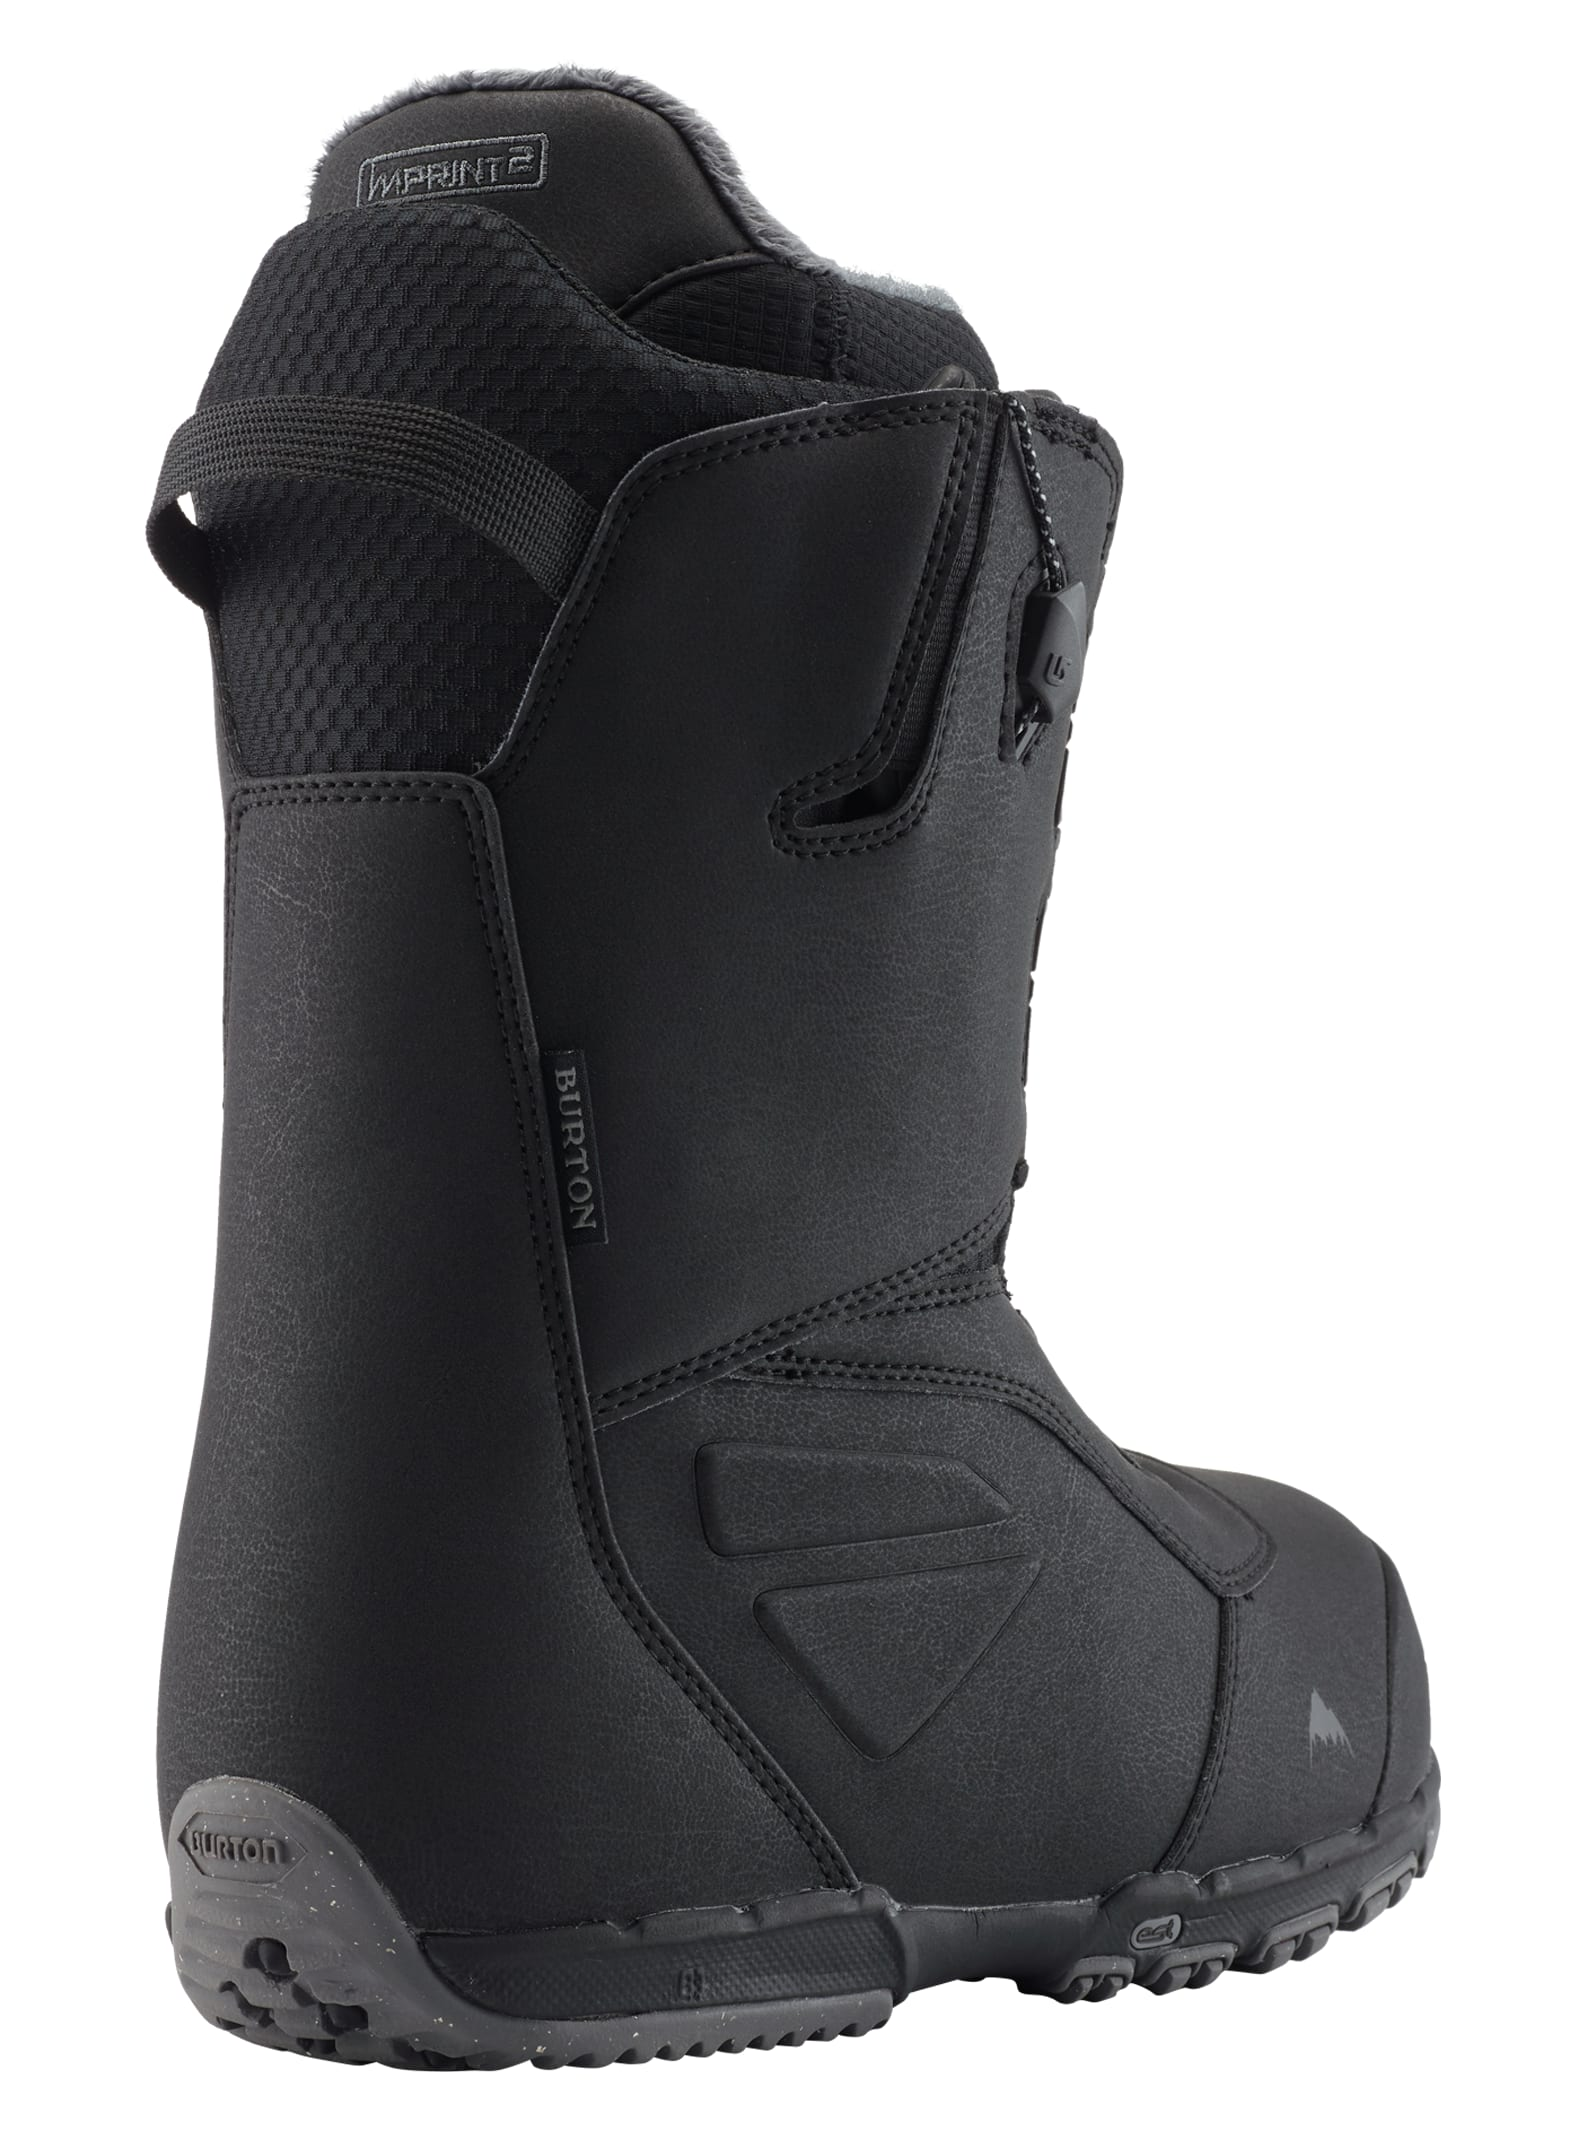 Snowboard Boots   Burton Snowboards